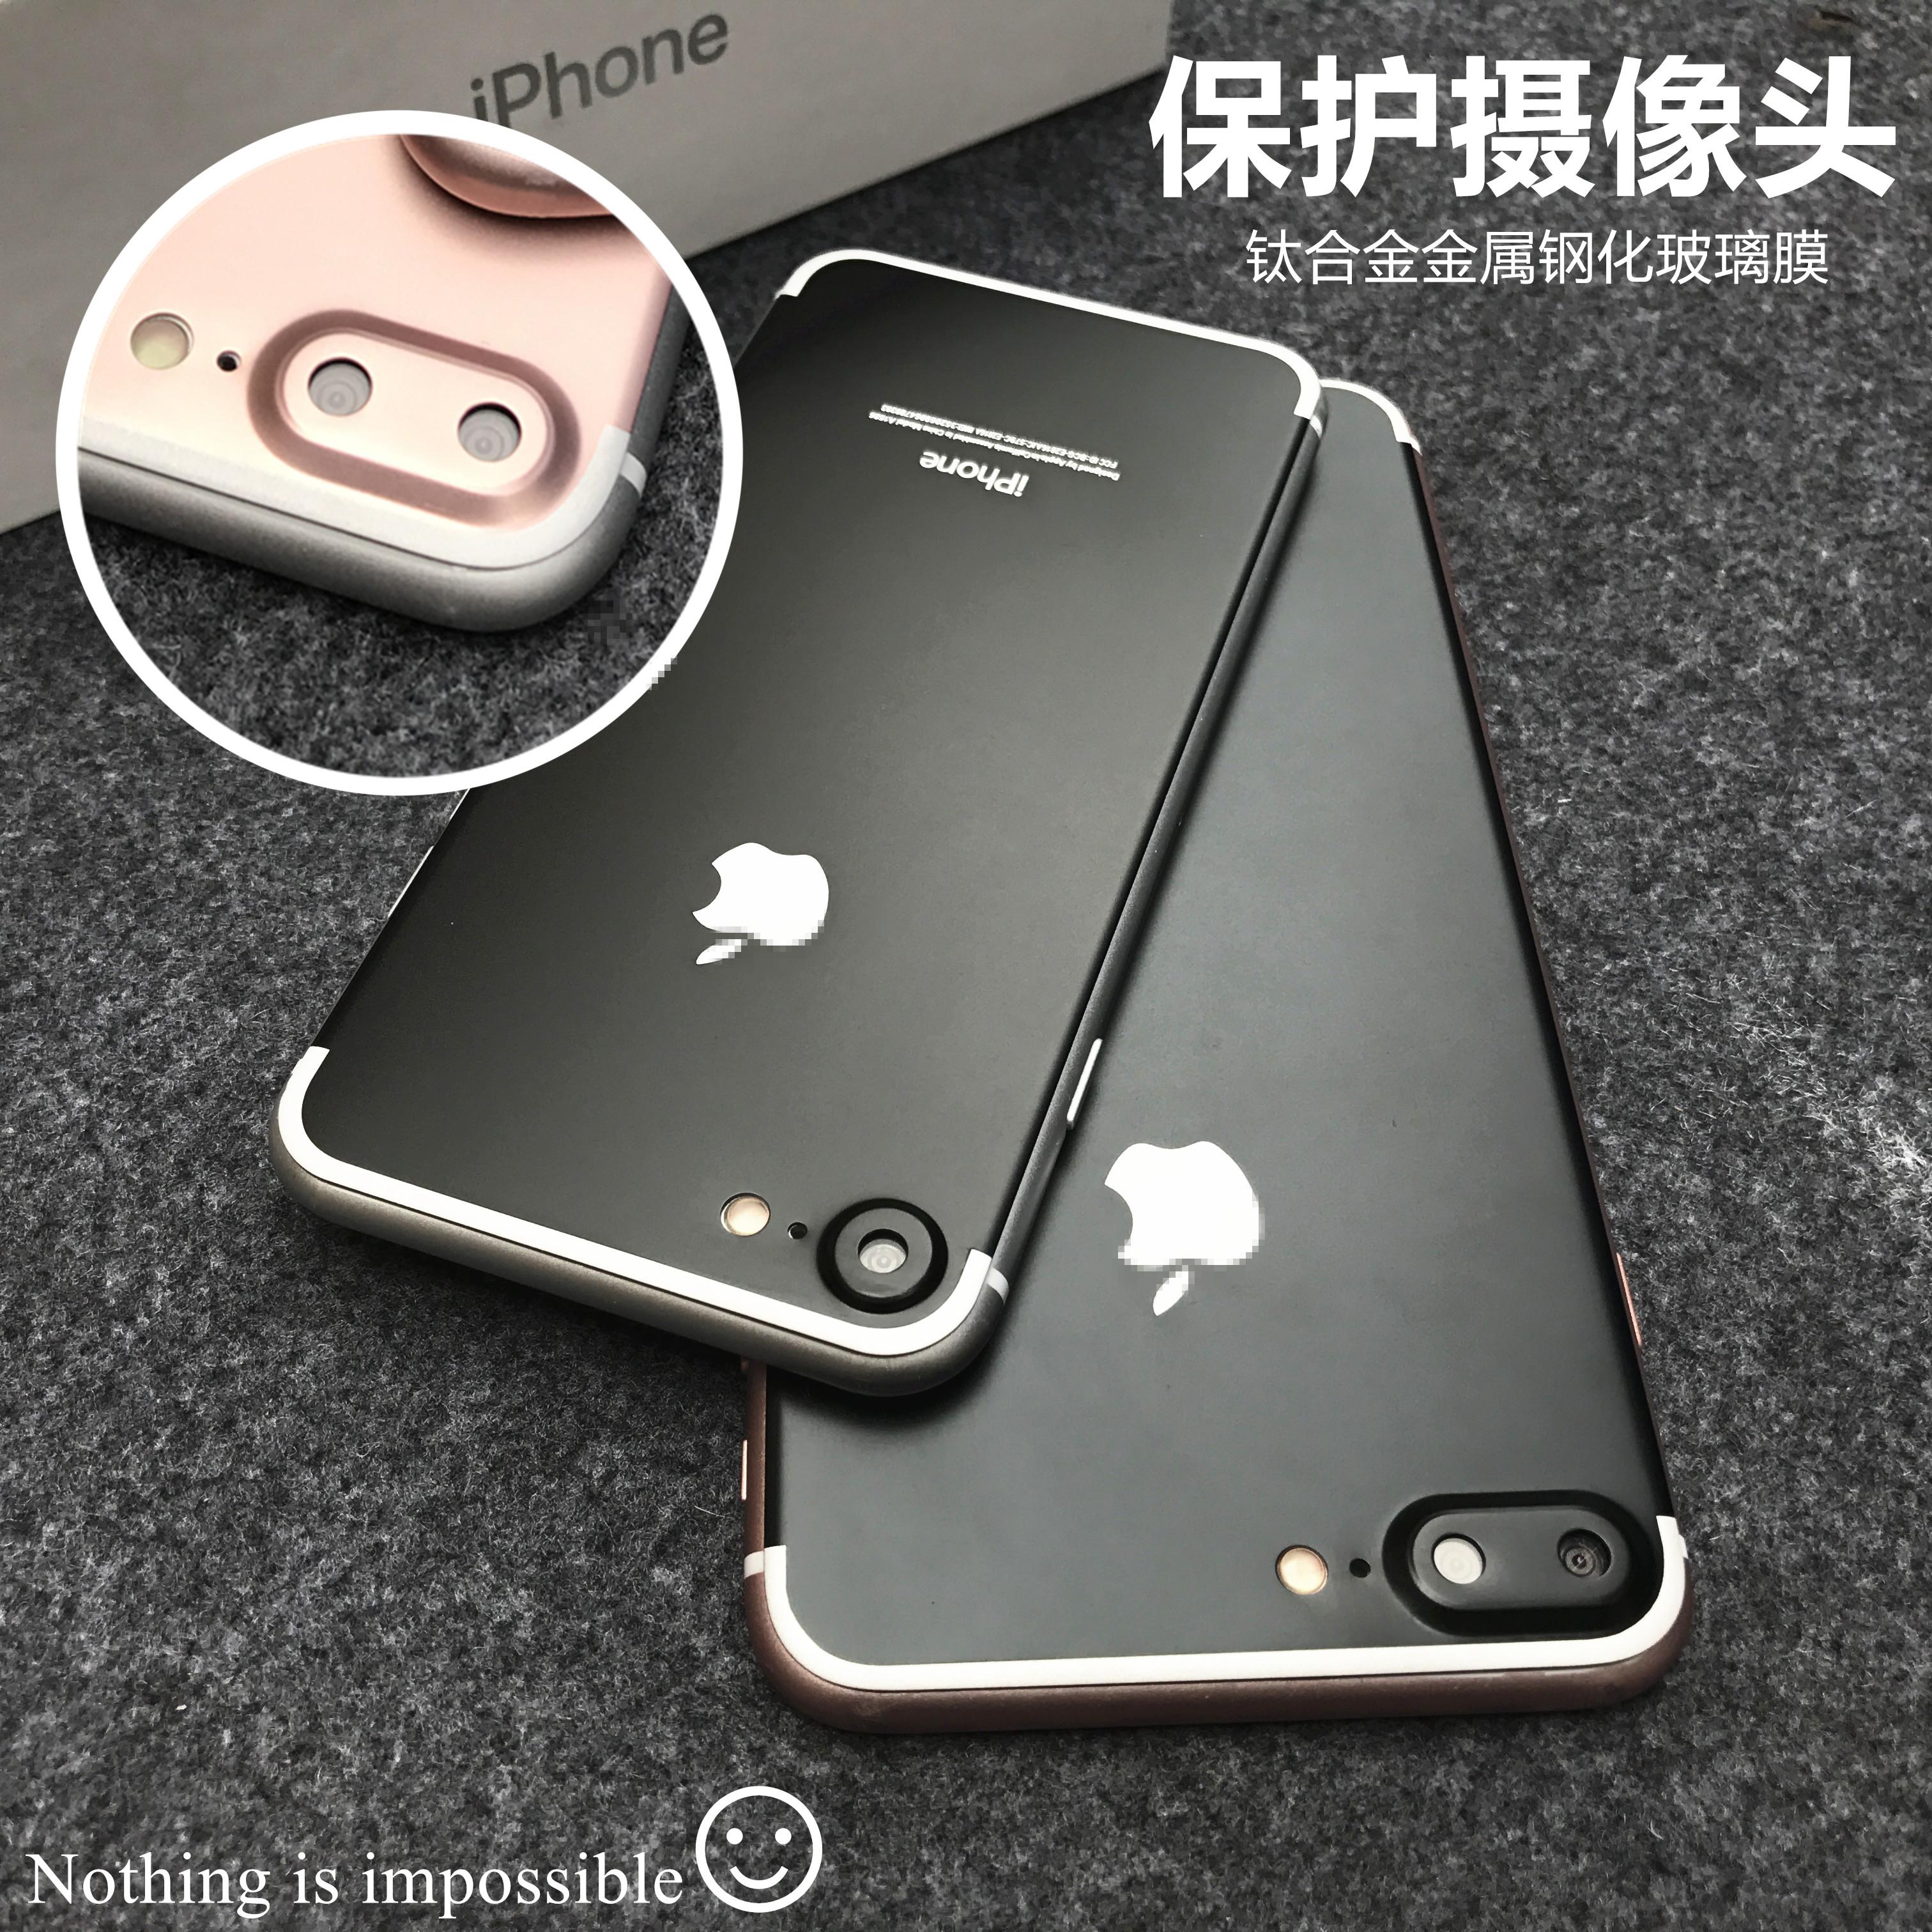 iPhone7钢化膜苹果7Plus全屏全覆盖手机保护膜6s彩色前后3D曲面膜